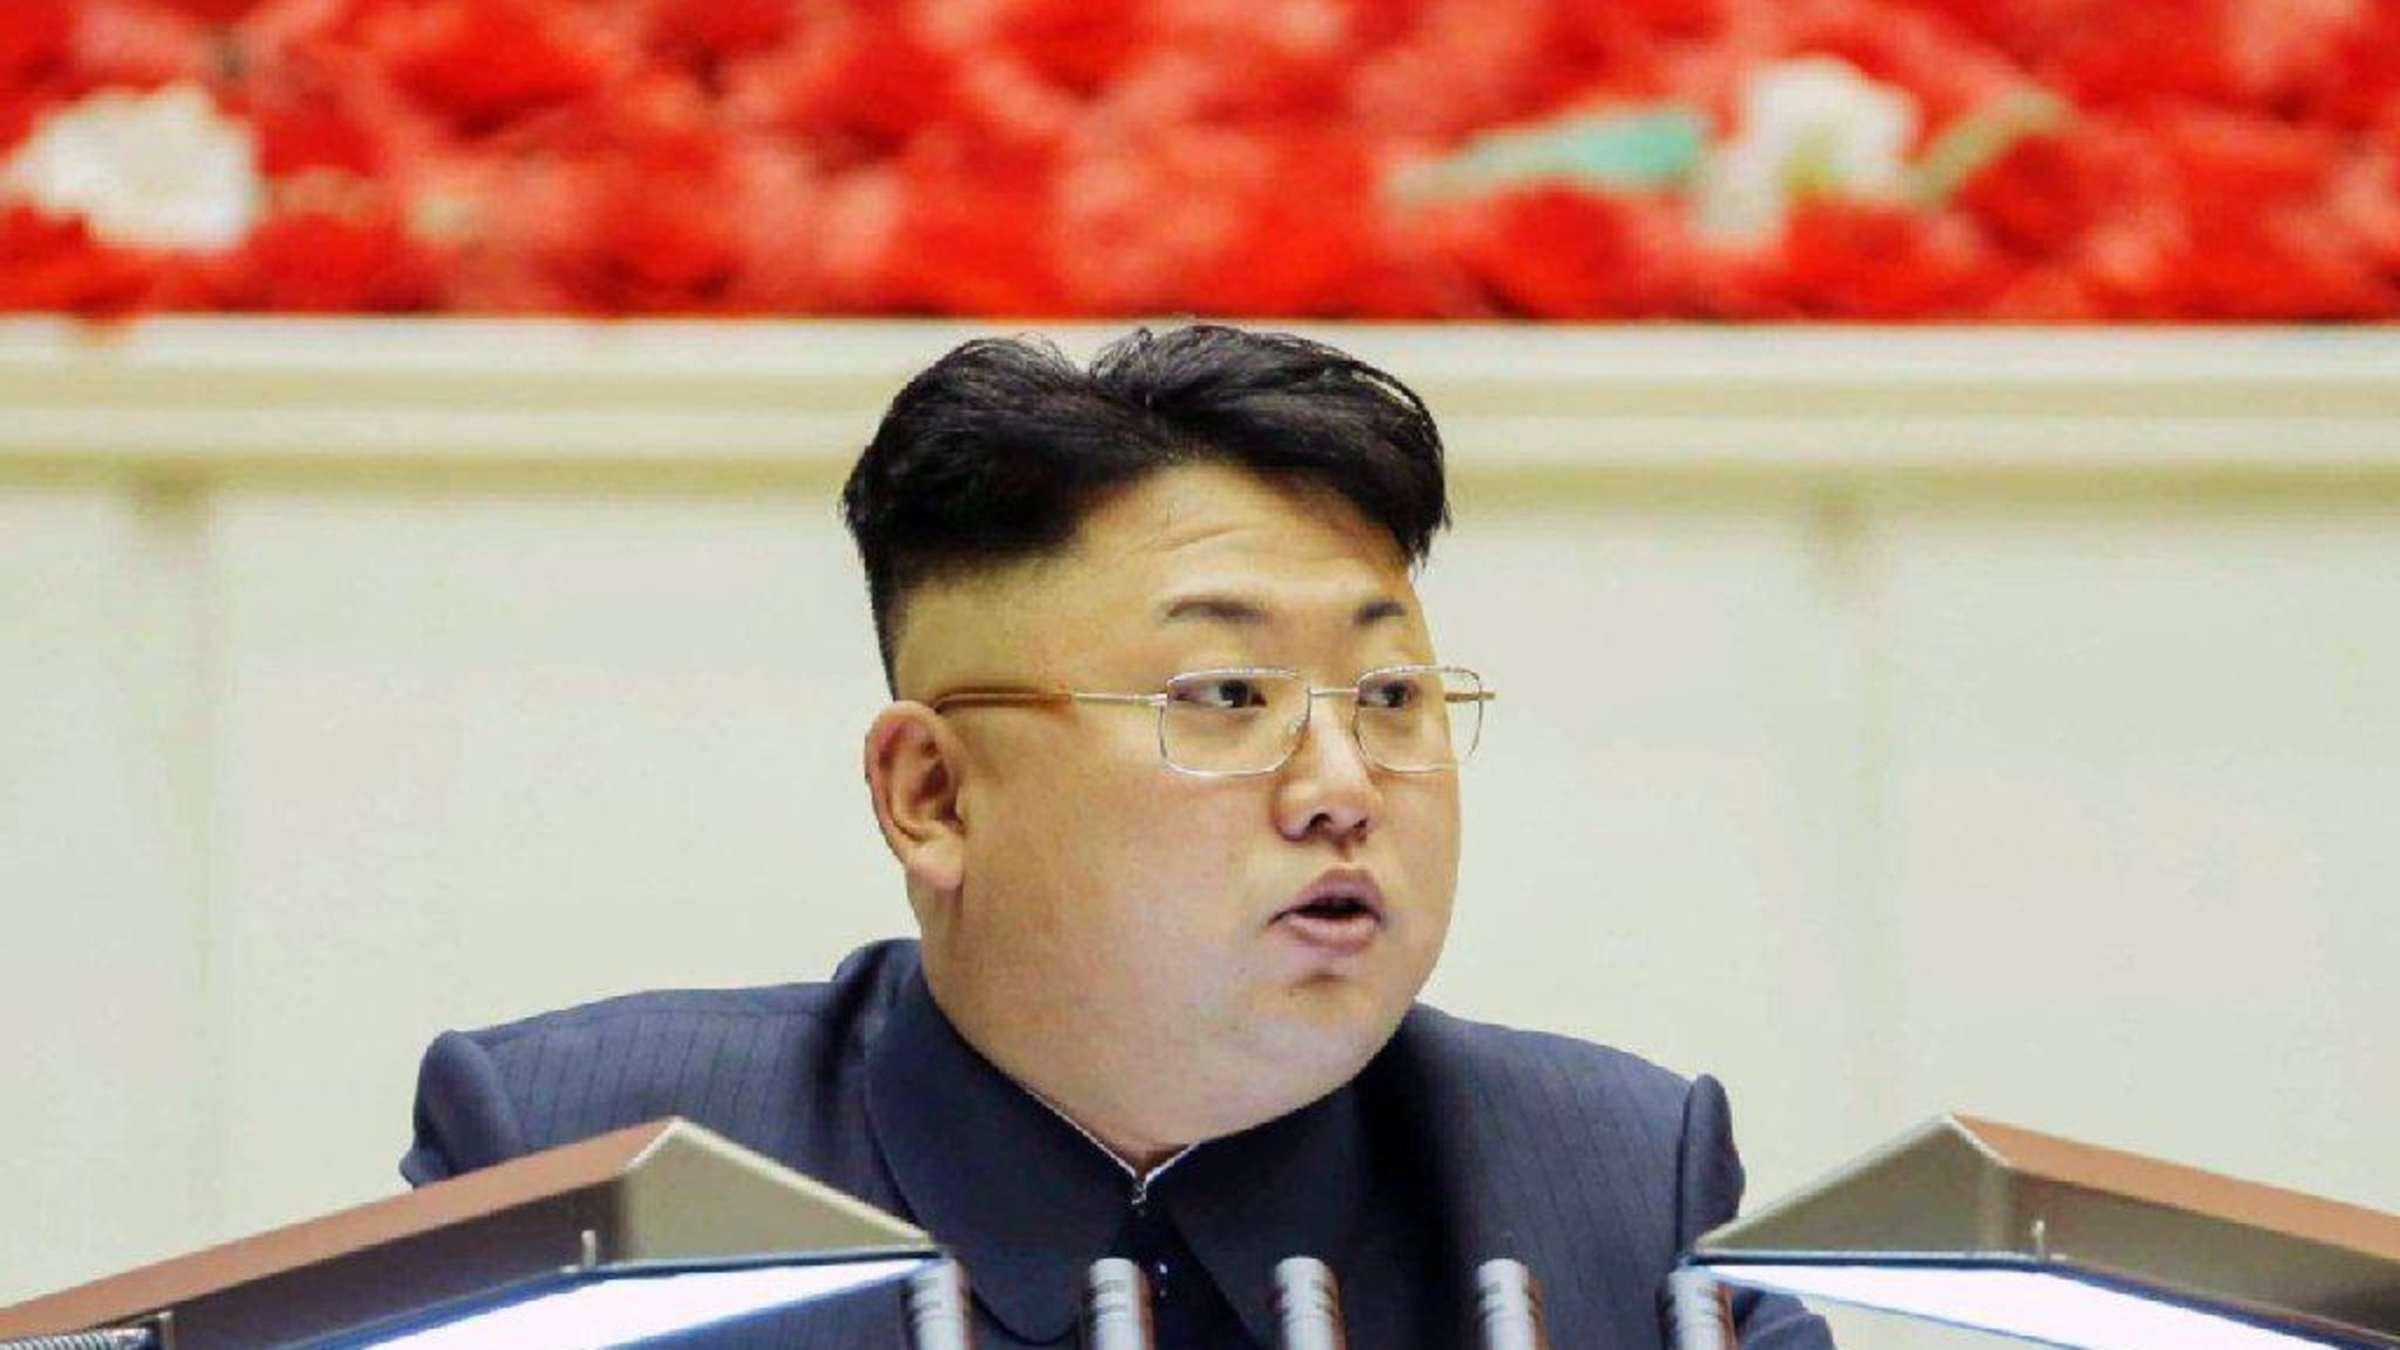 Alle sollen aussehen wie Kim Jong Un  Panorama